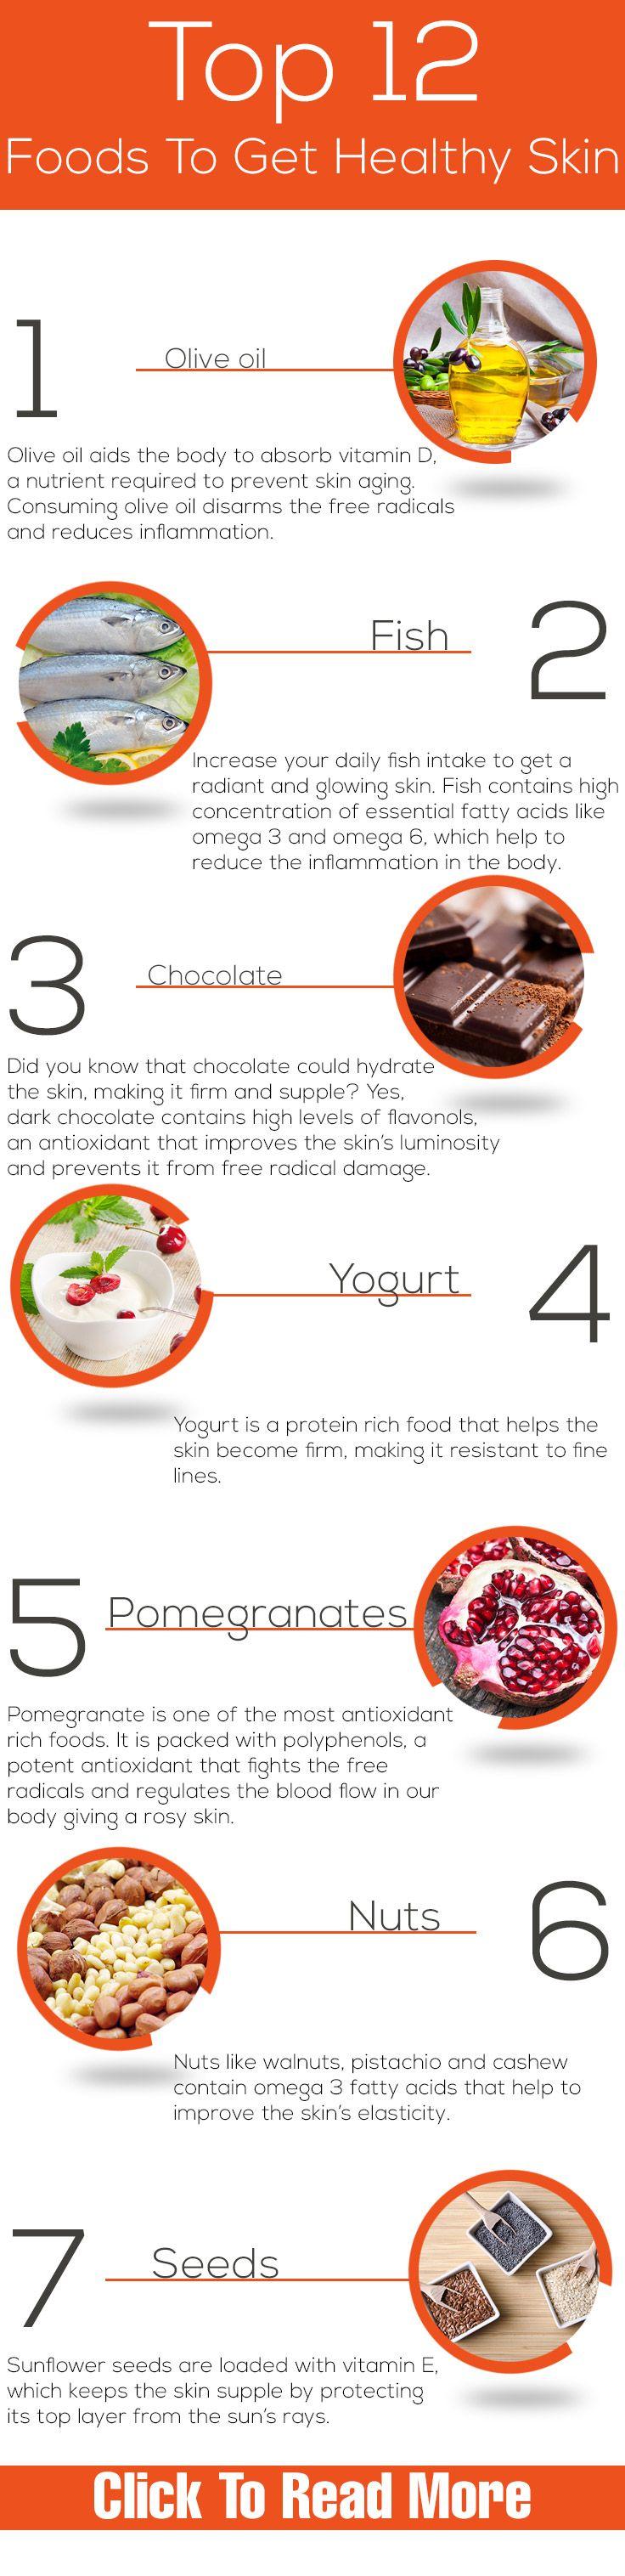 Top 12 Foods To Get Healthy Skin